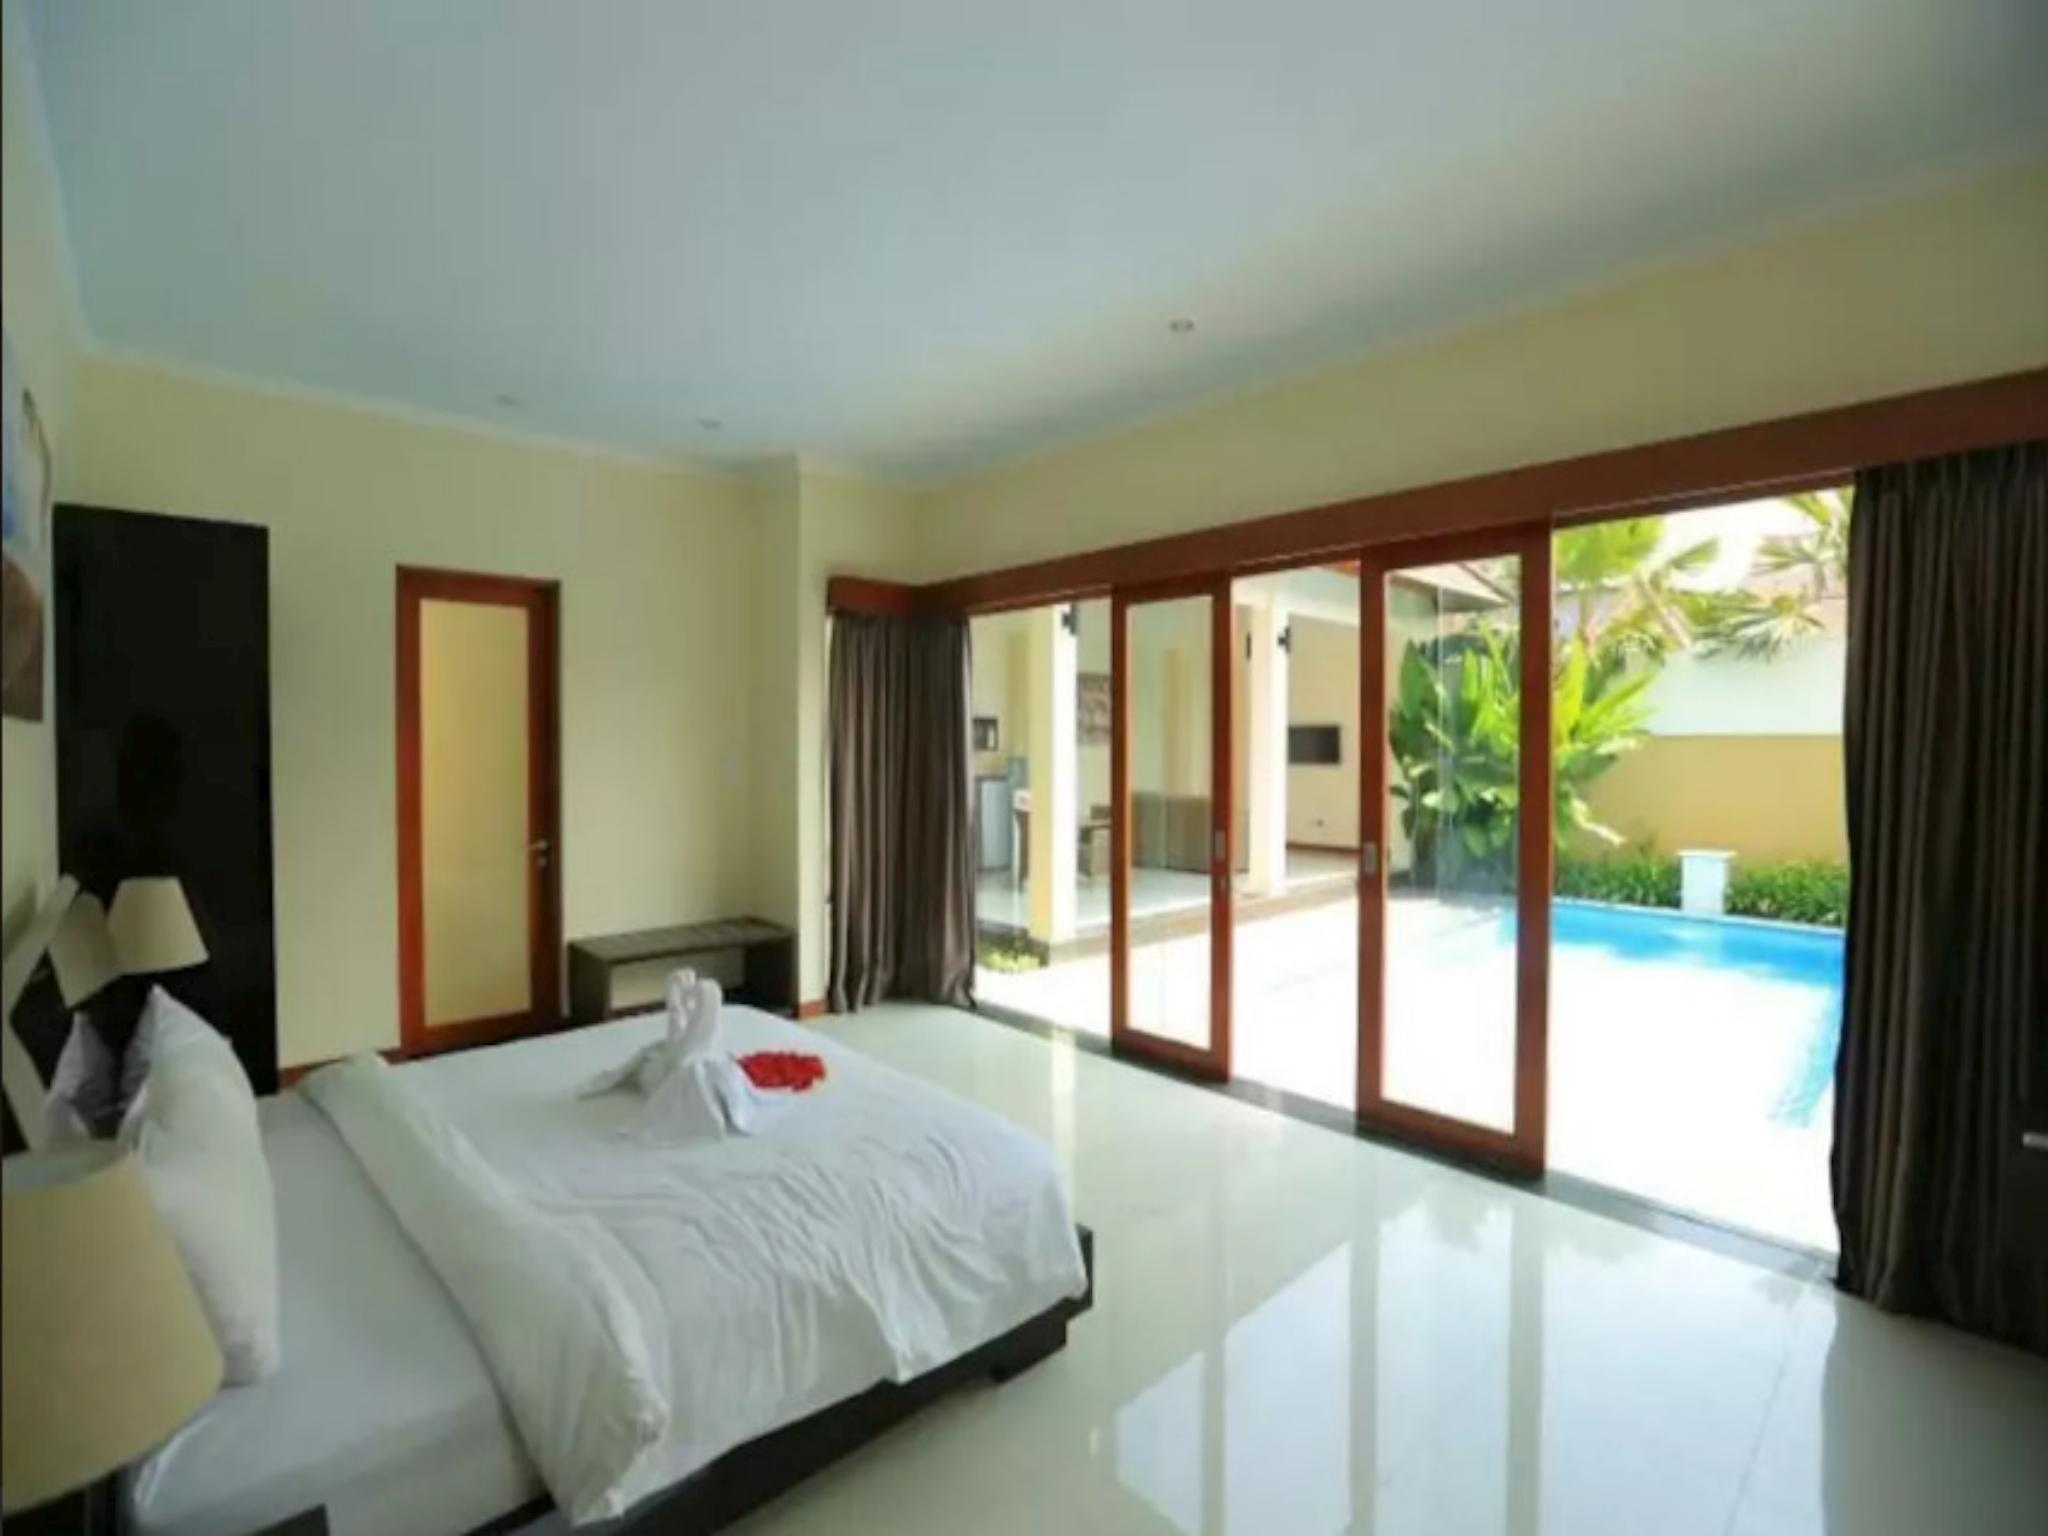 1 BRoom Private Pool Villa And Kitchen In Seminyak